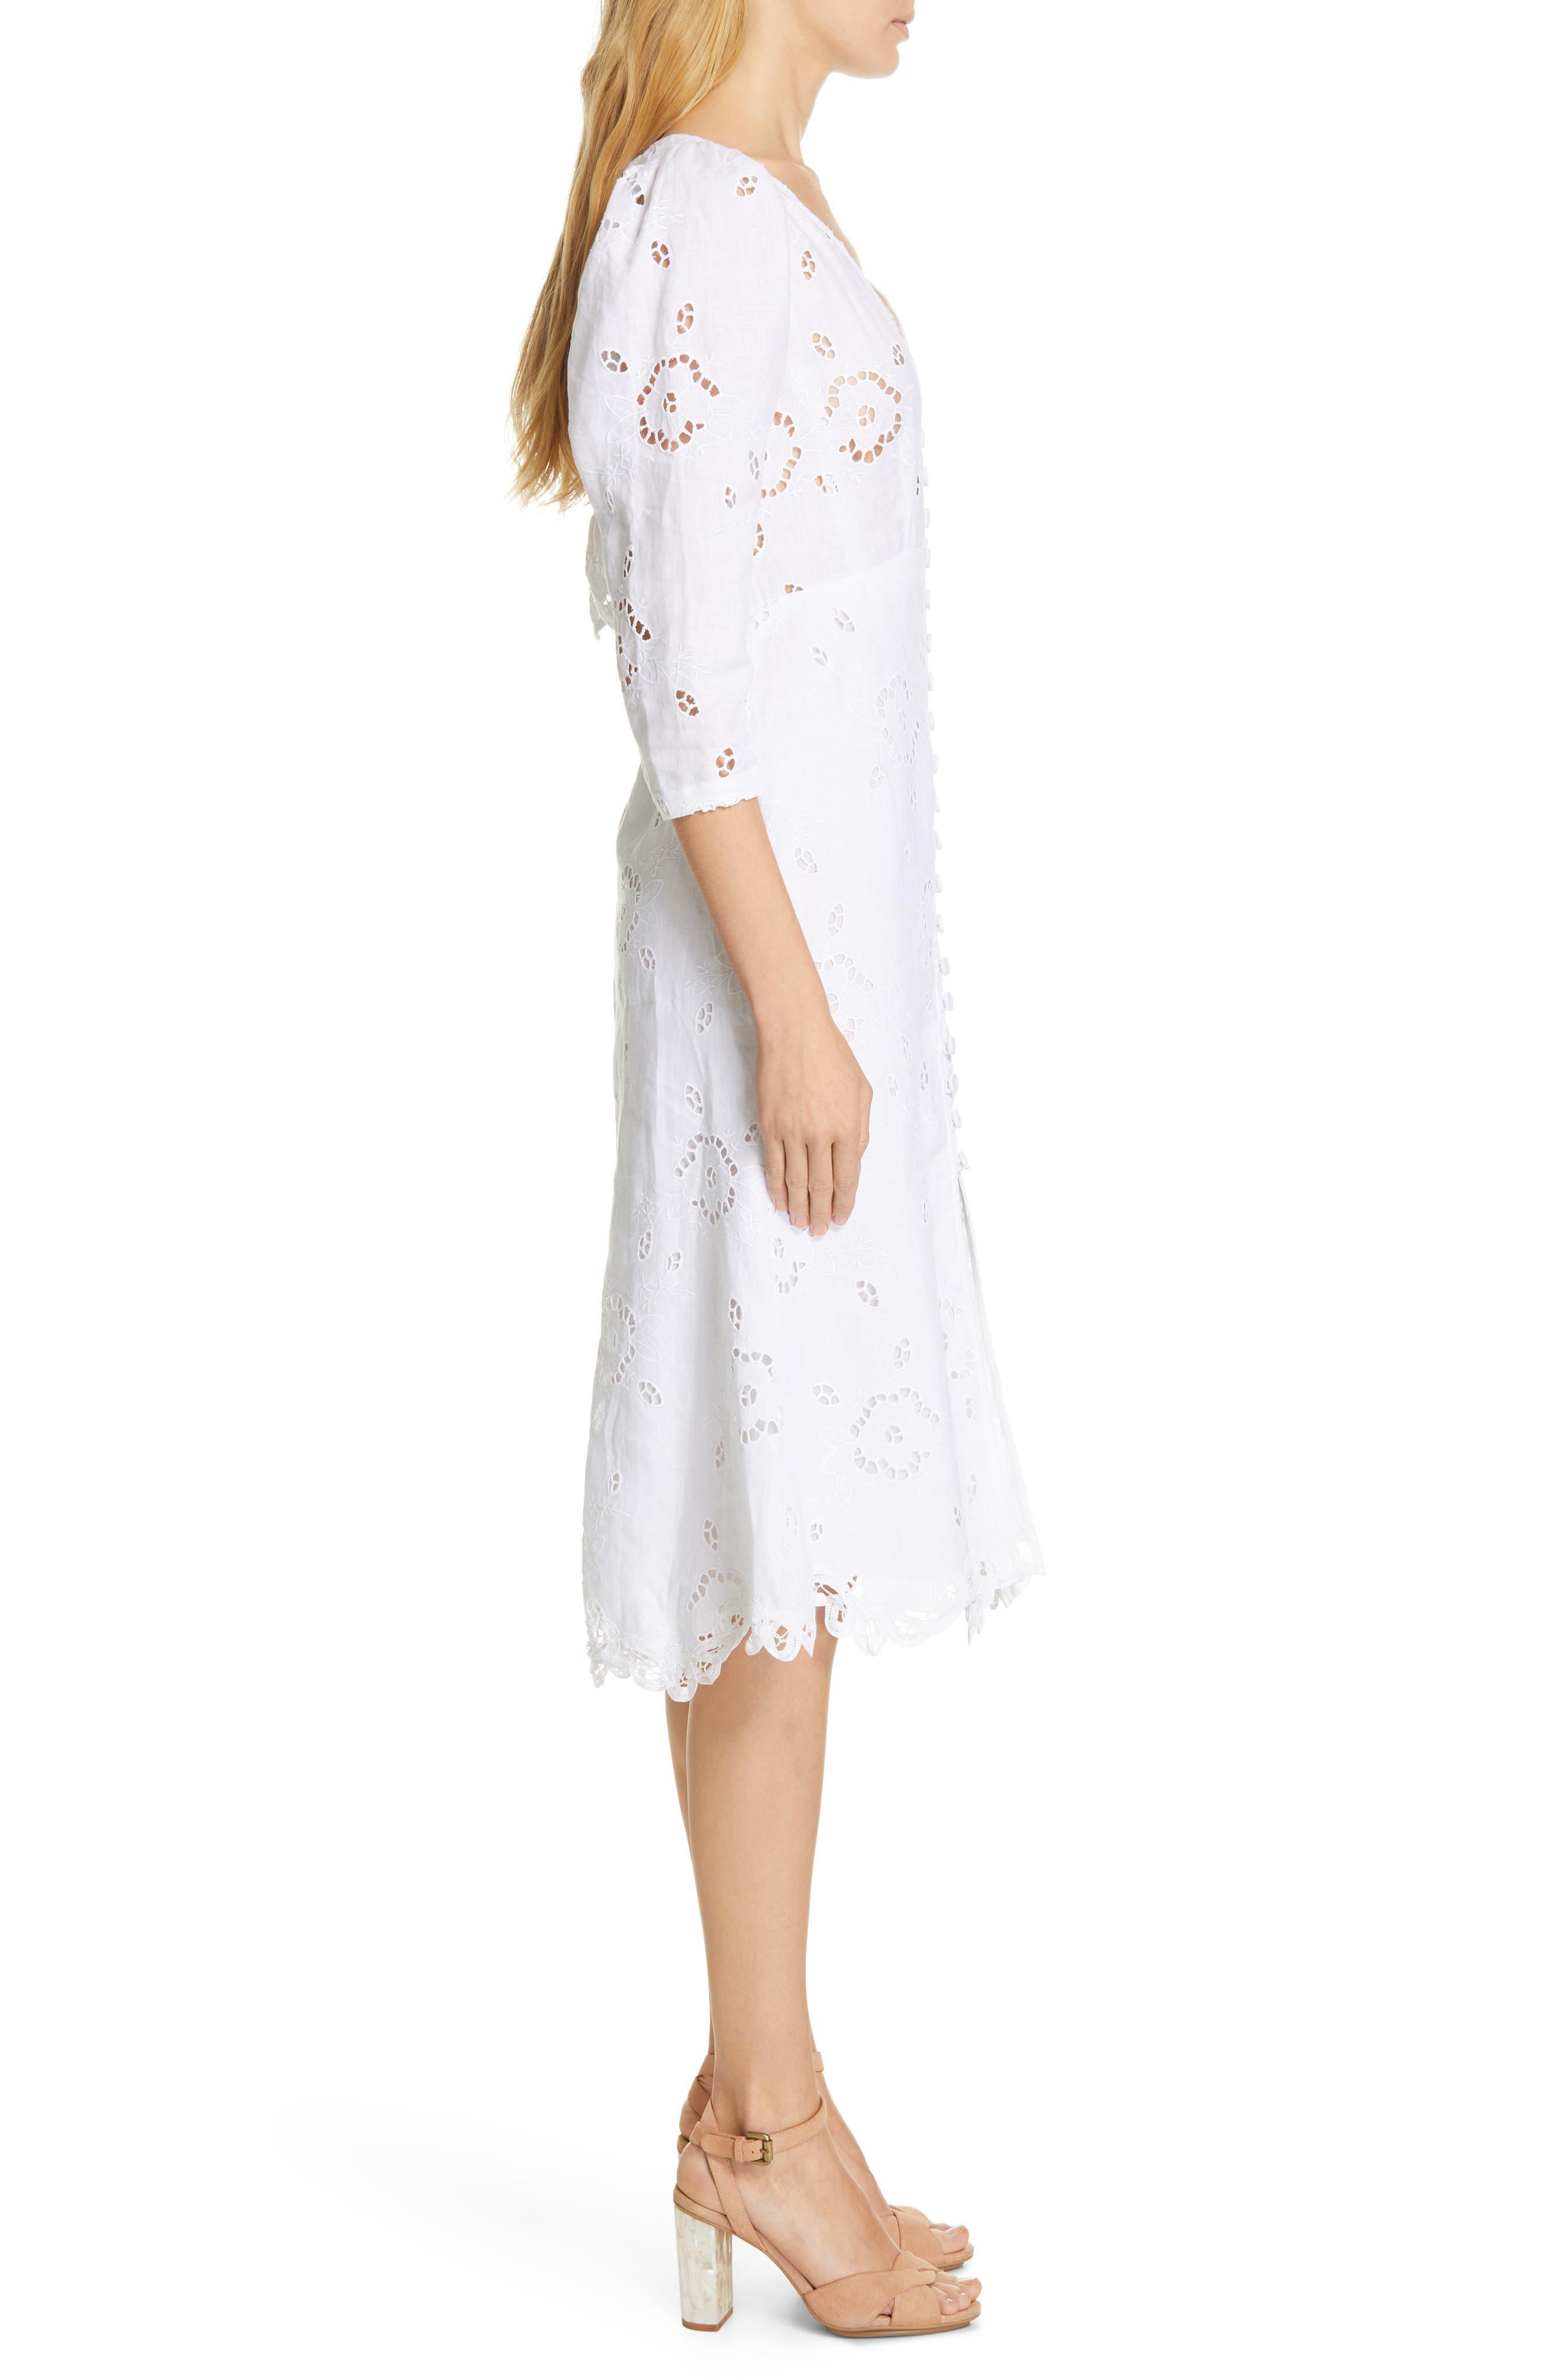 REBECCA TAYLOR,                             Terri Embroidered A-Line Dress,                             Alternate thumbnail 3, color,                             MILK